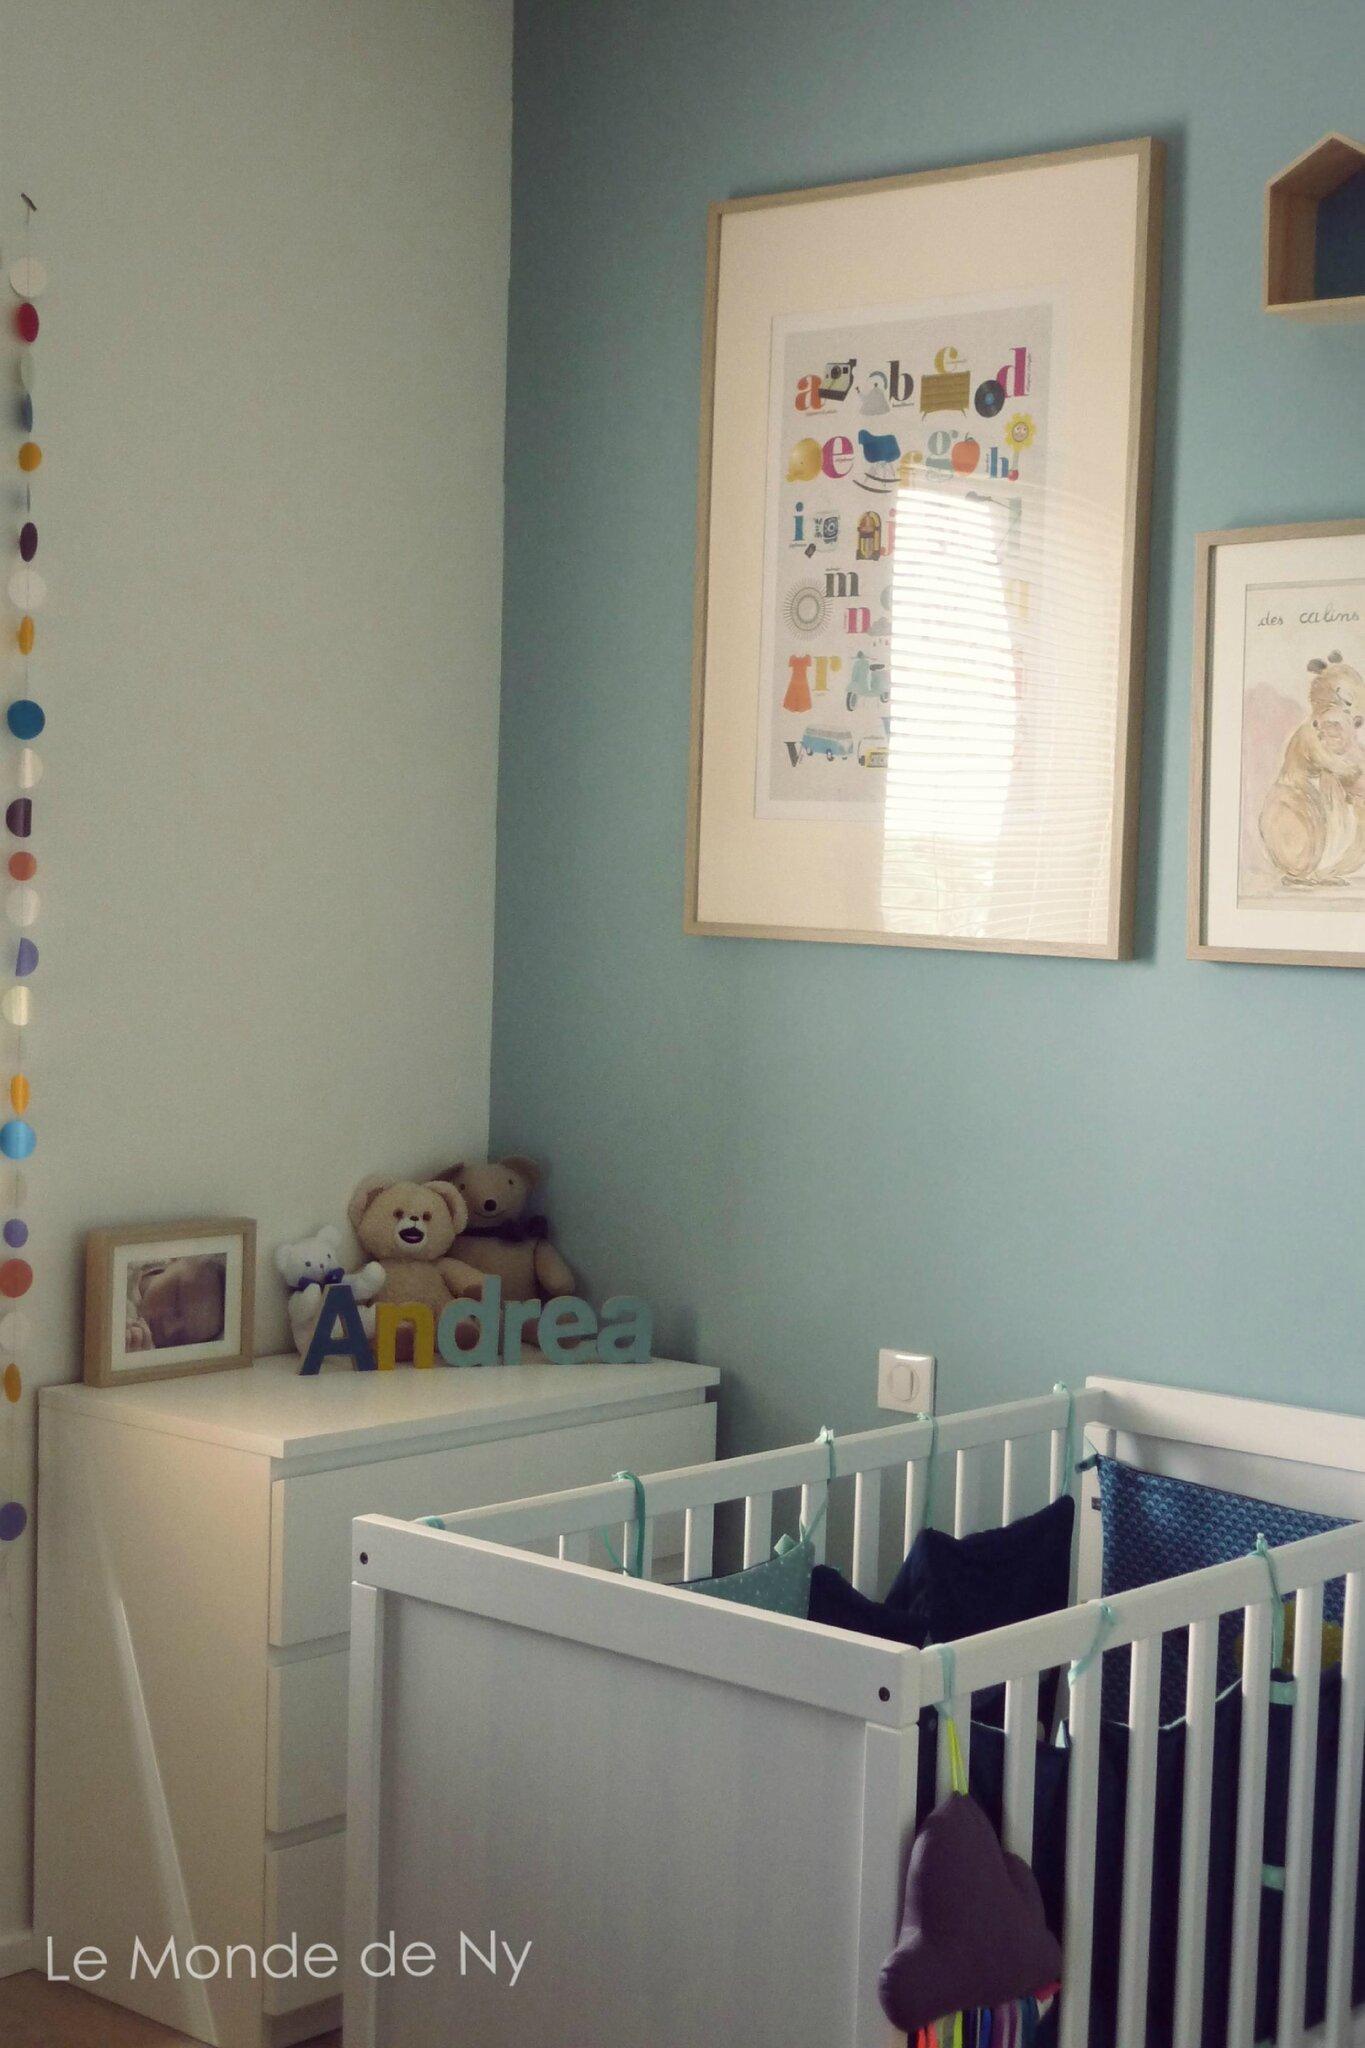 La chambre de Mini Ny Le Monde de Ny